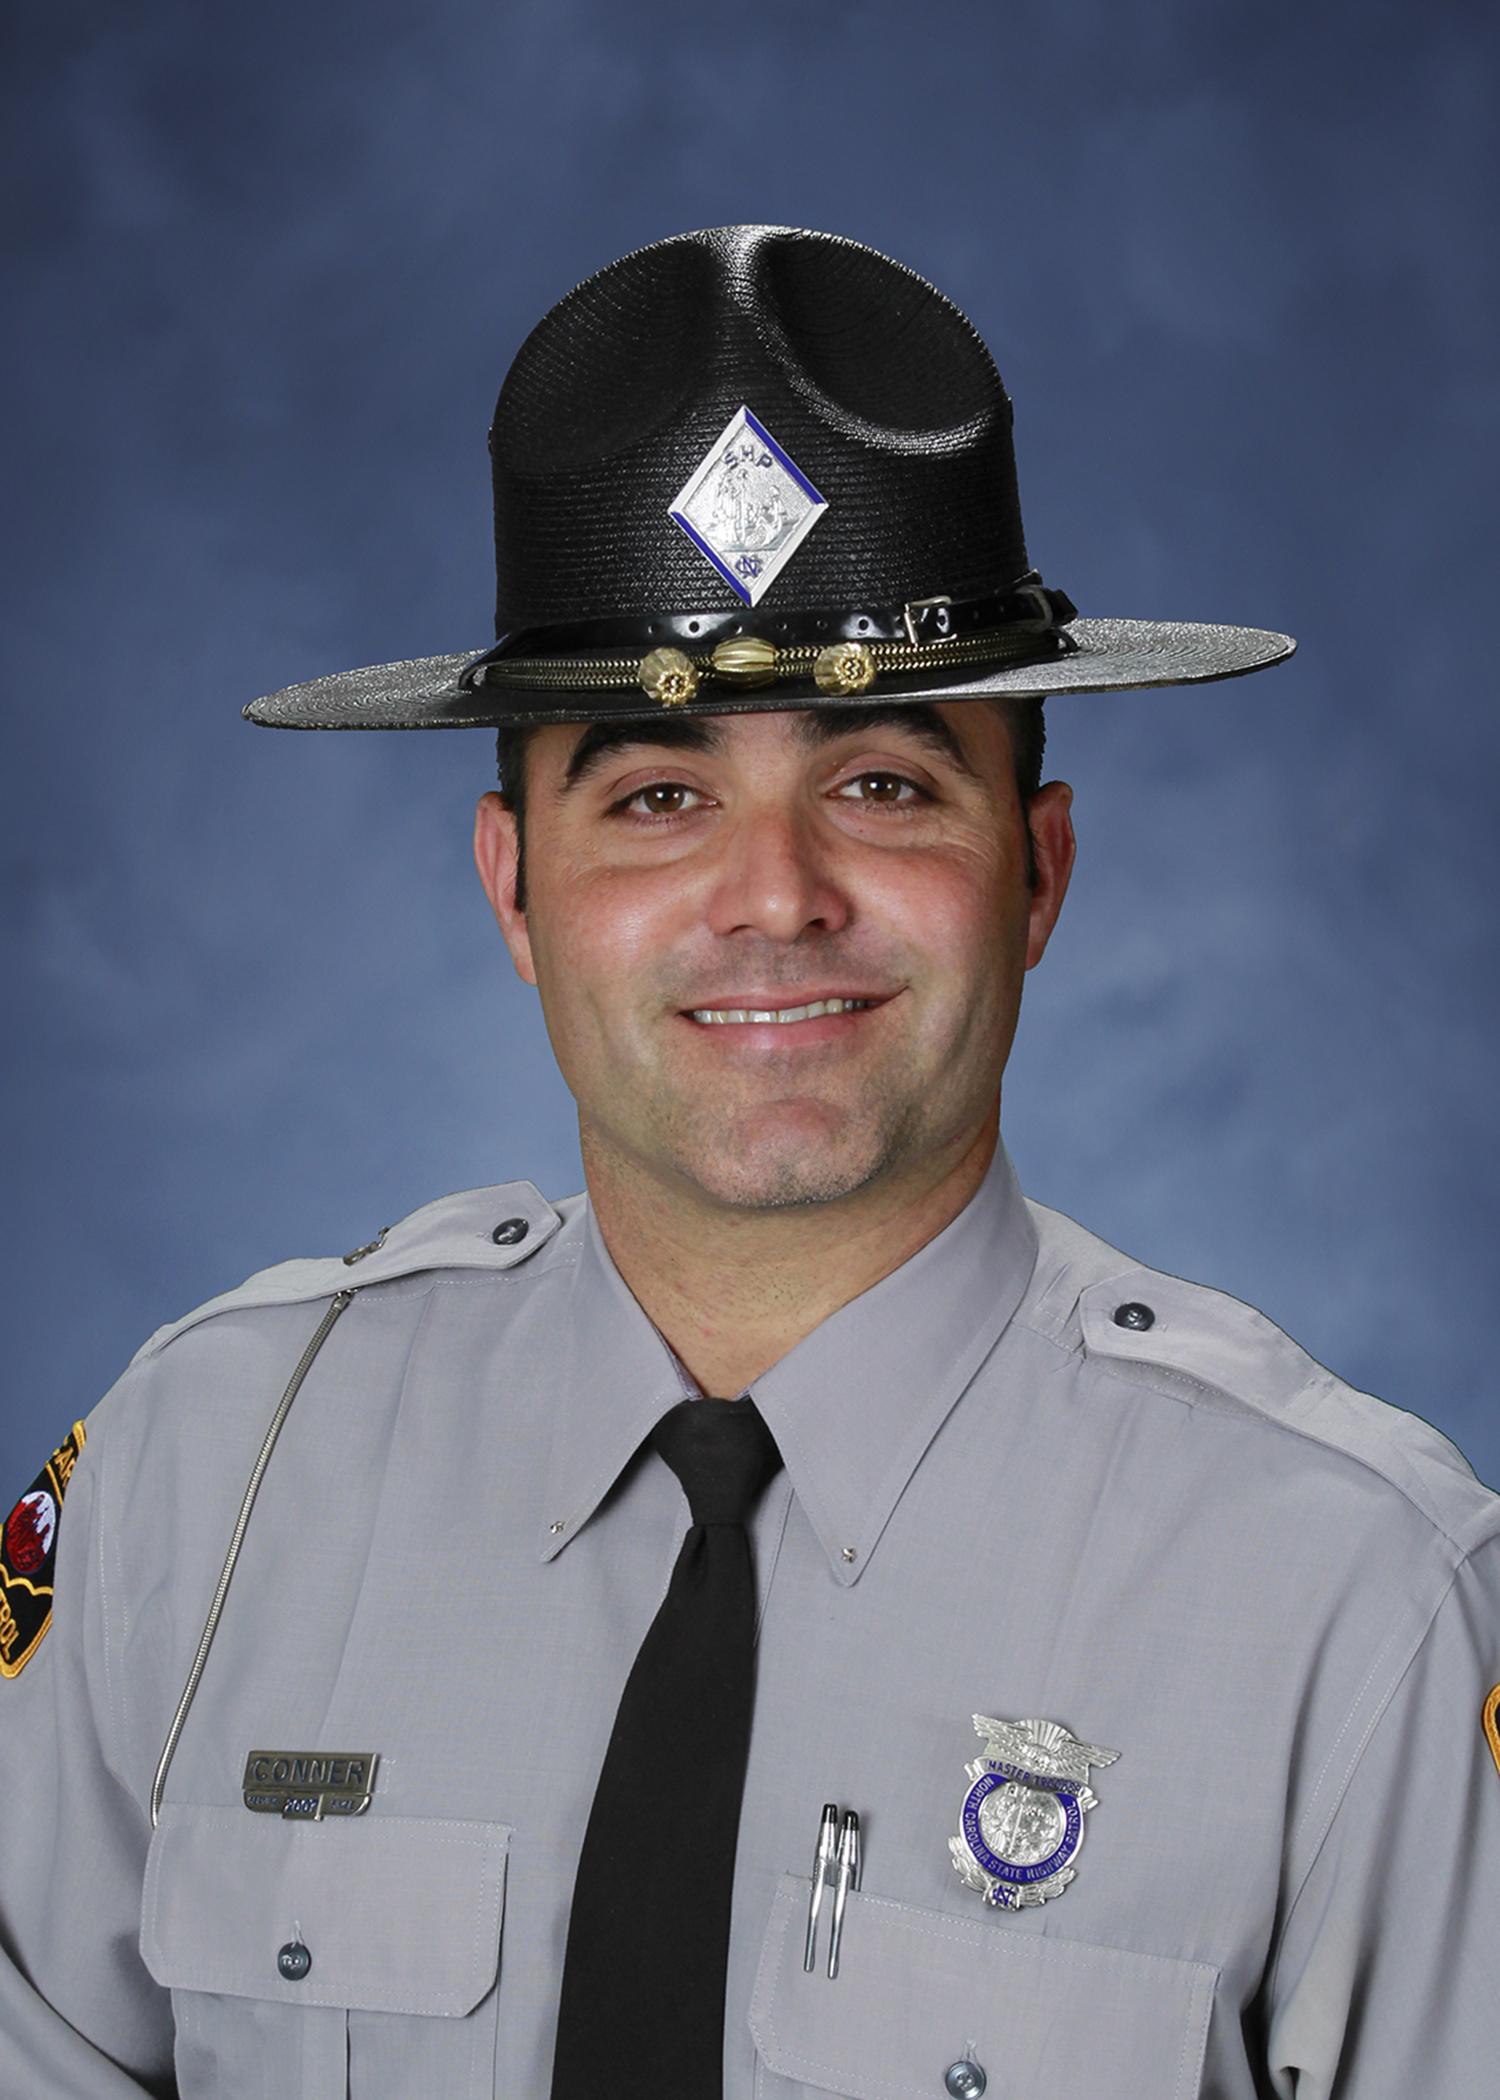 North Carolina Highway Patrol, Trooper Kevin Conner